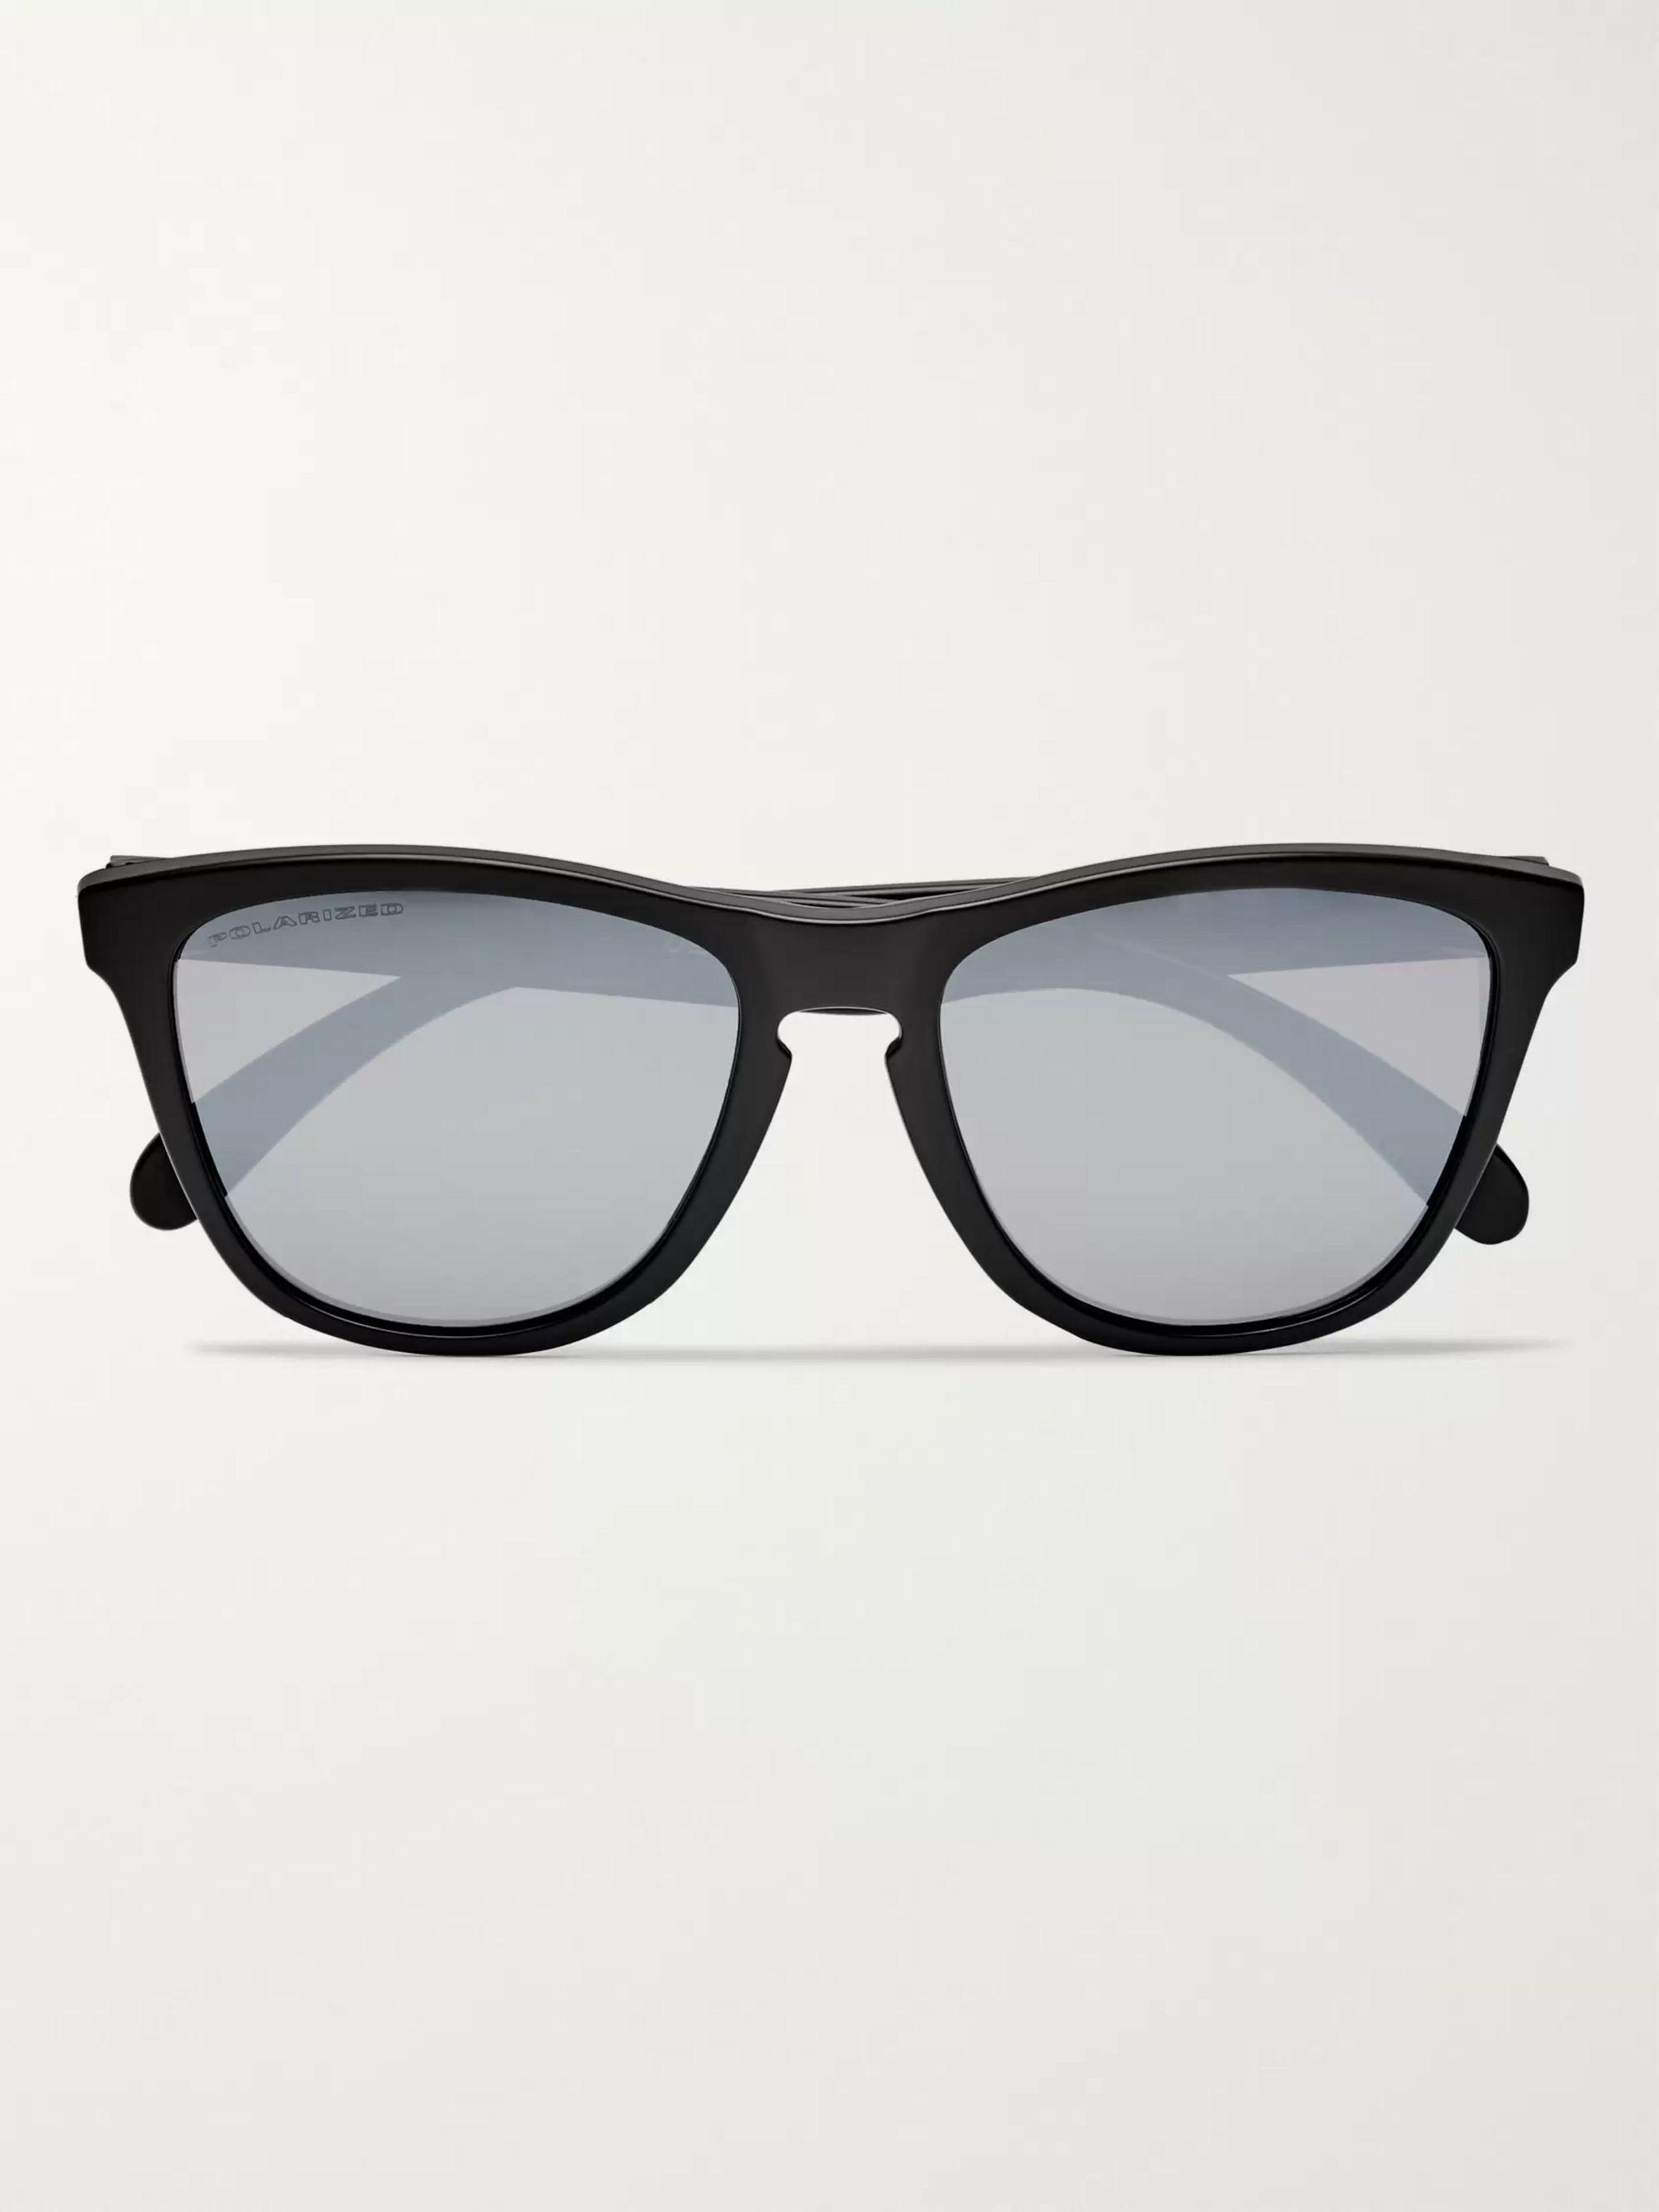 OAKLEY Frogskins D-Frame O Matter Polarised Sunglasses